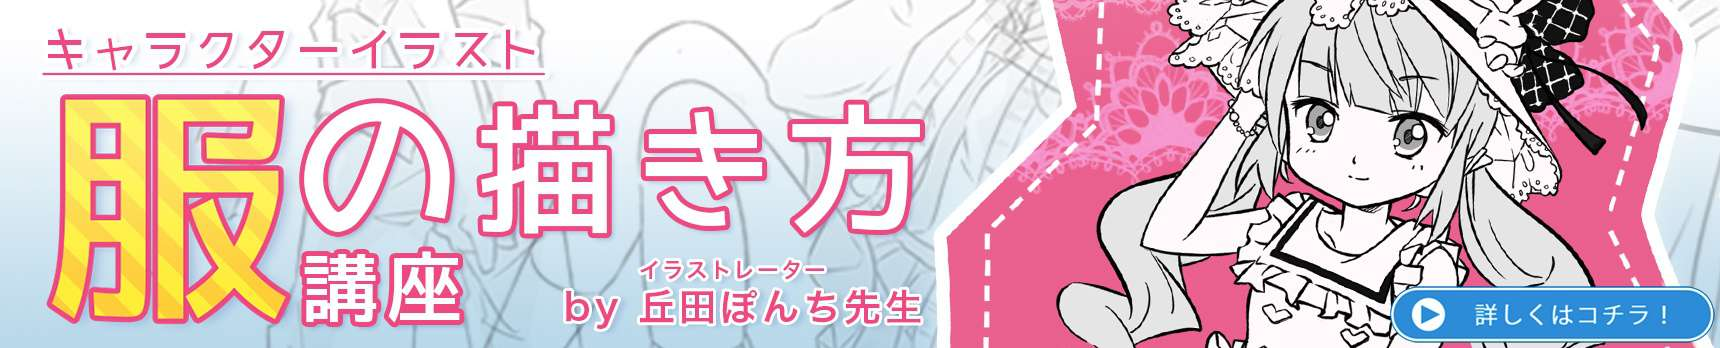 Okada banner pc2